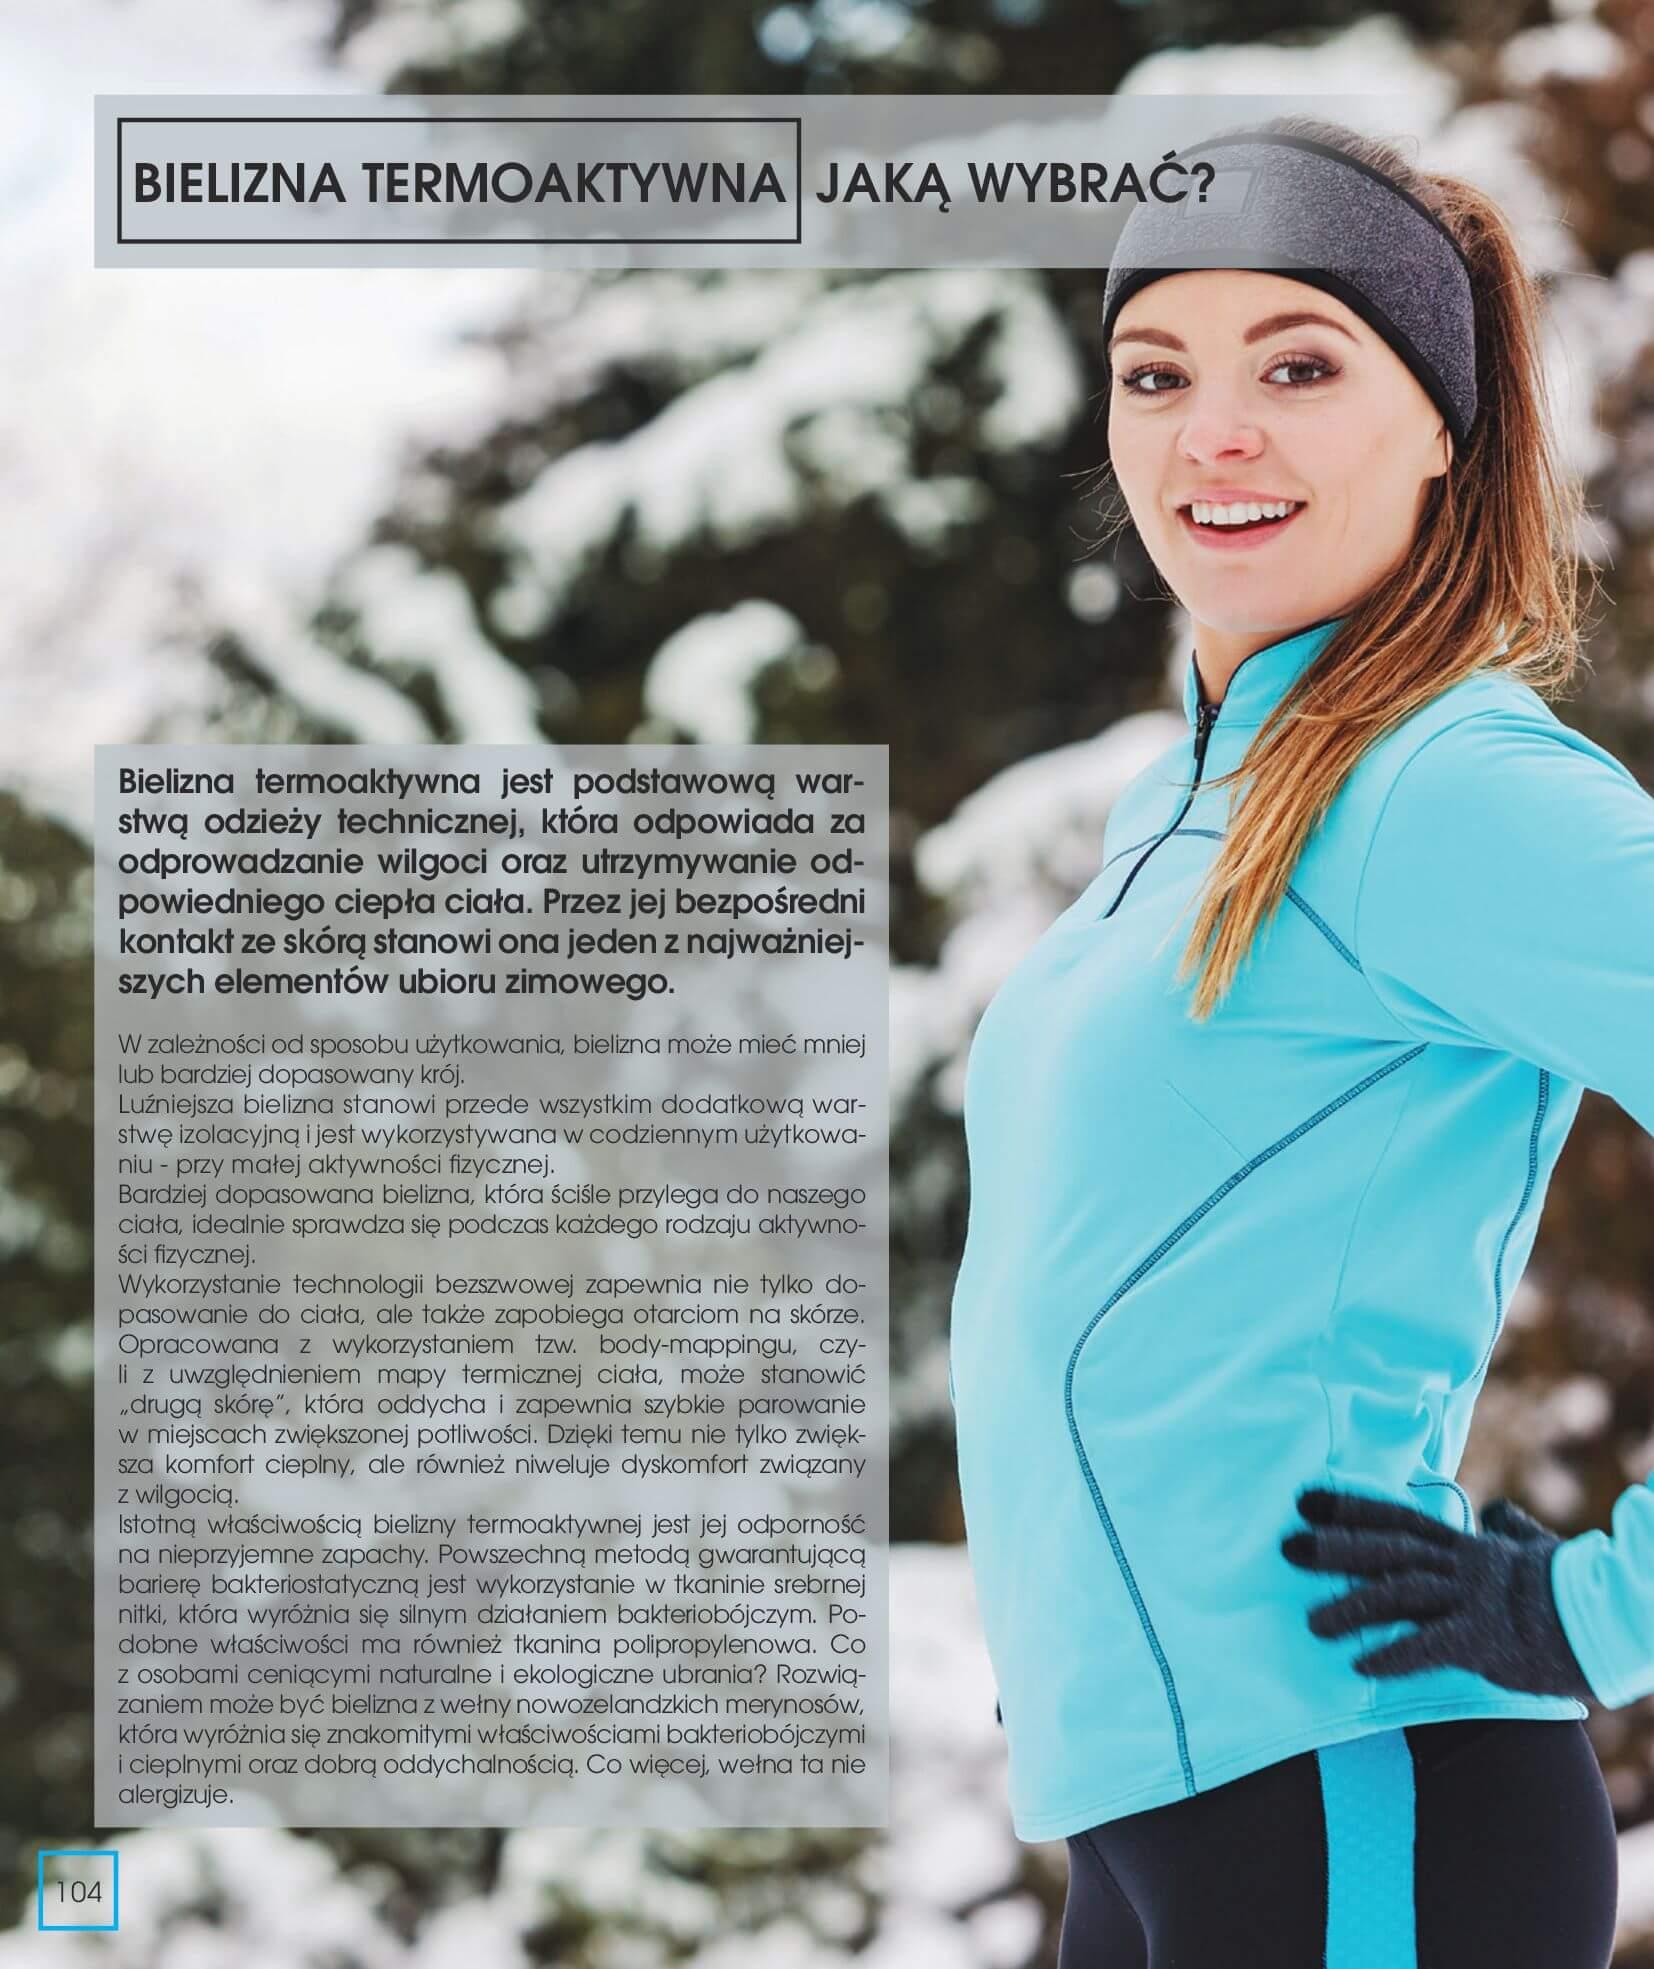 Gazetka Go Sport - Katalog Zima 2017/2018-12.11.2017-28.02.2018-page-104